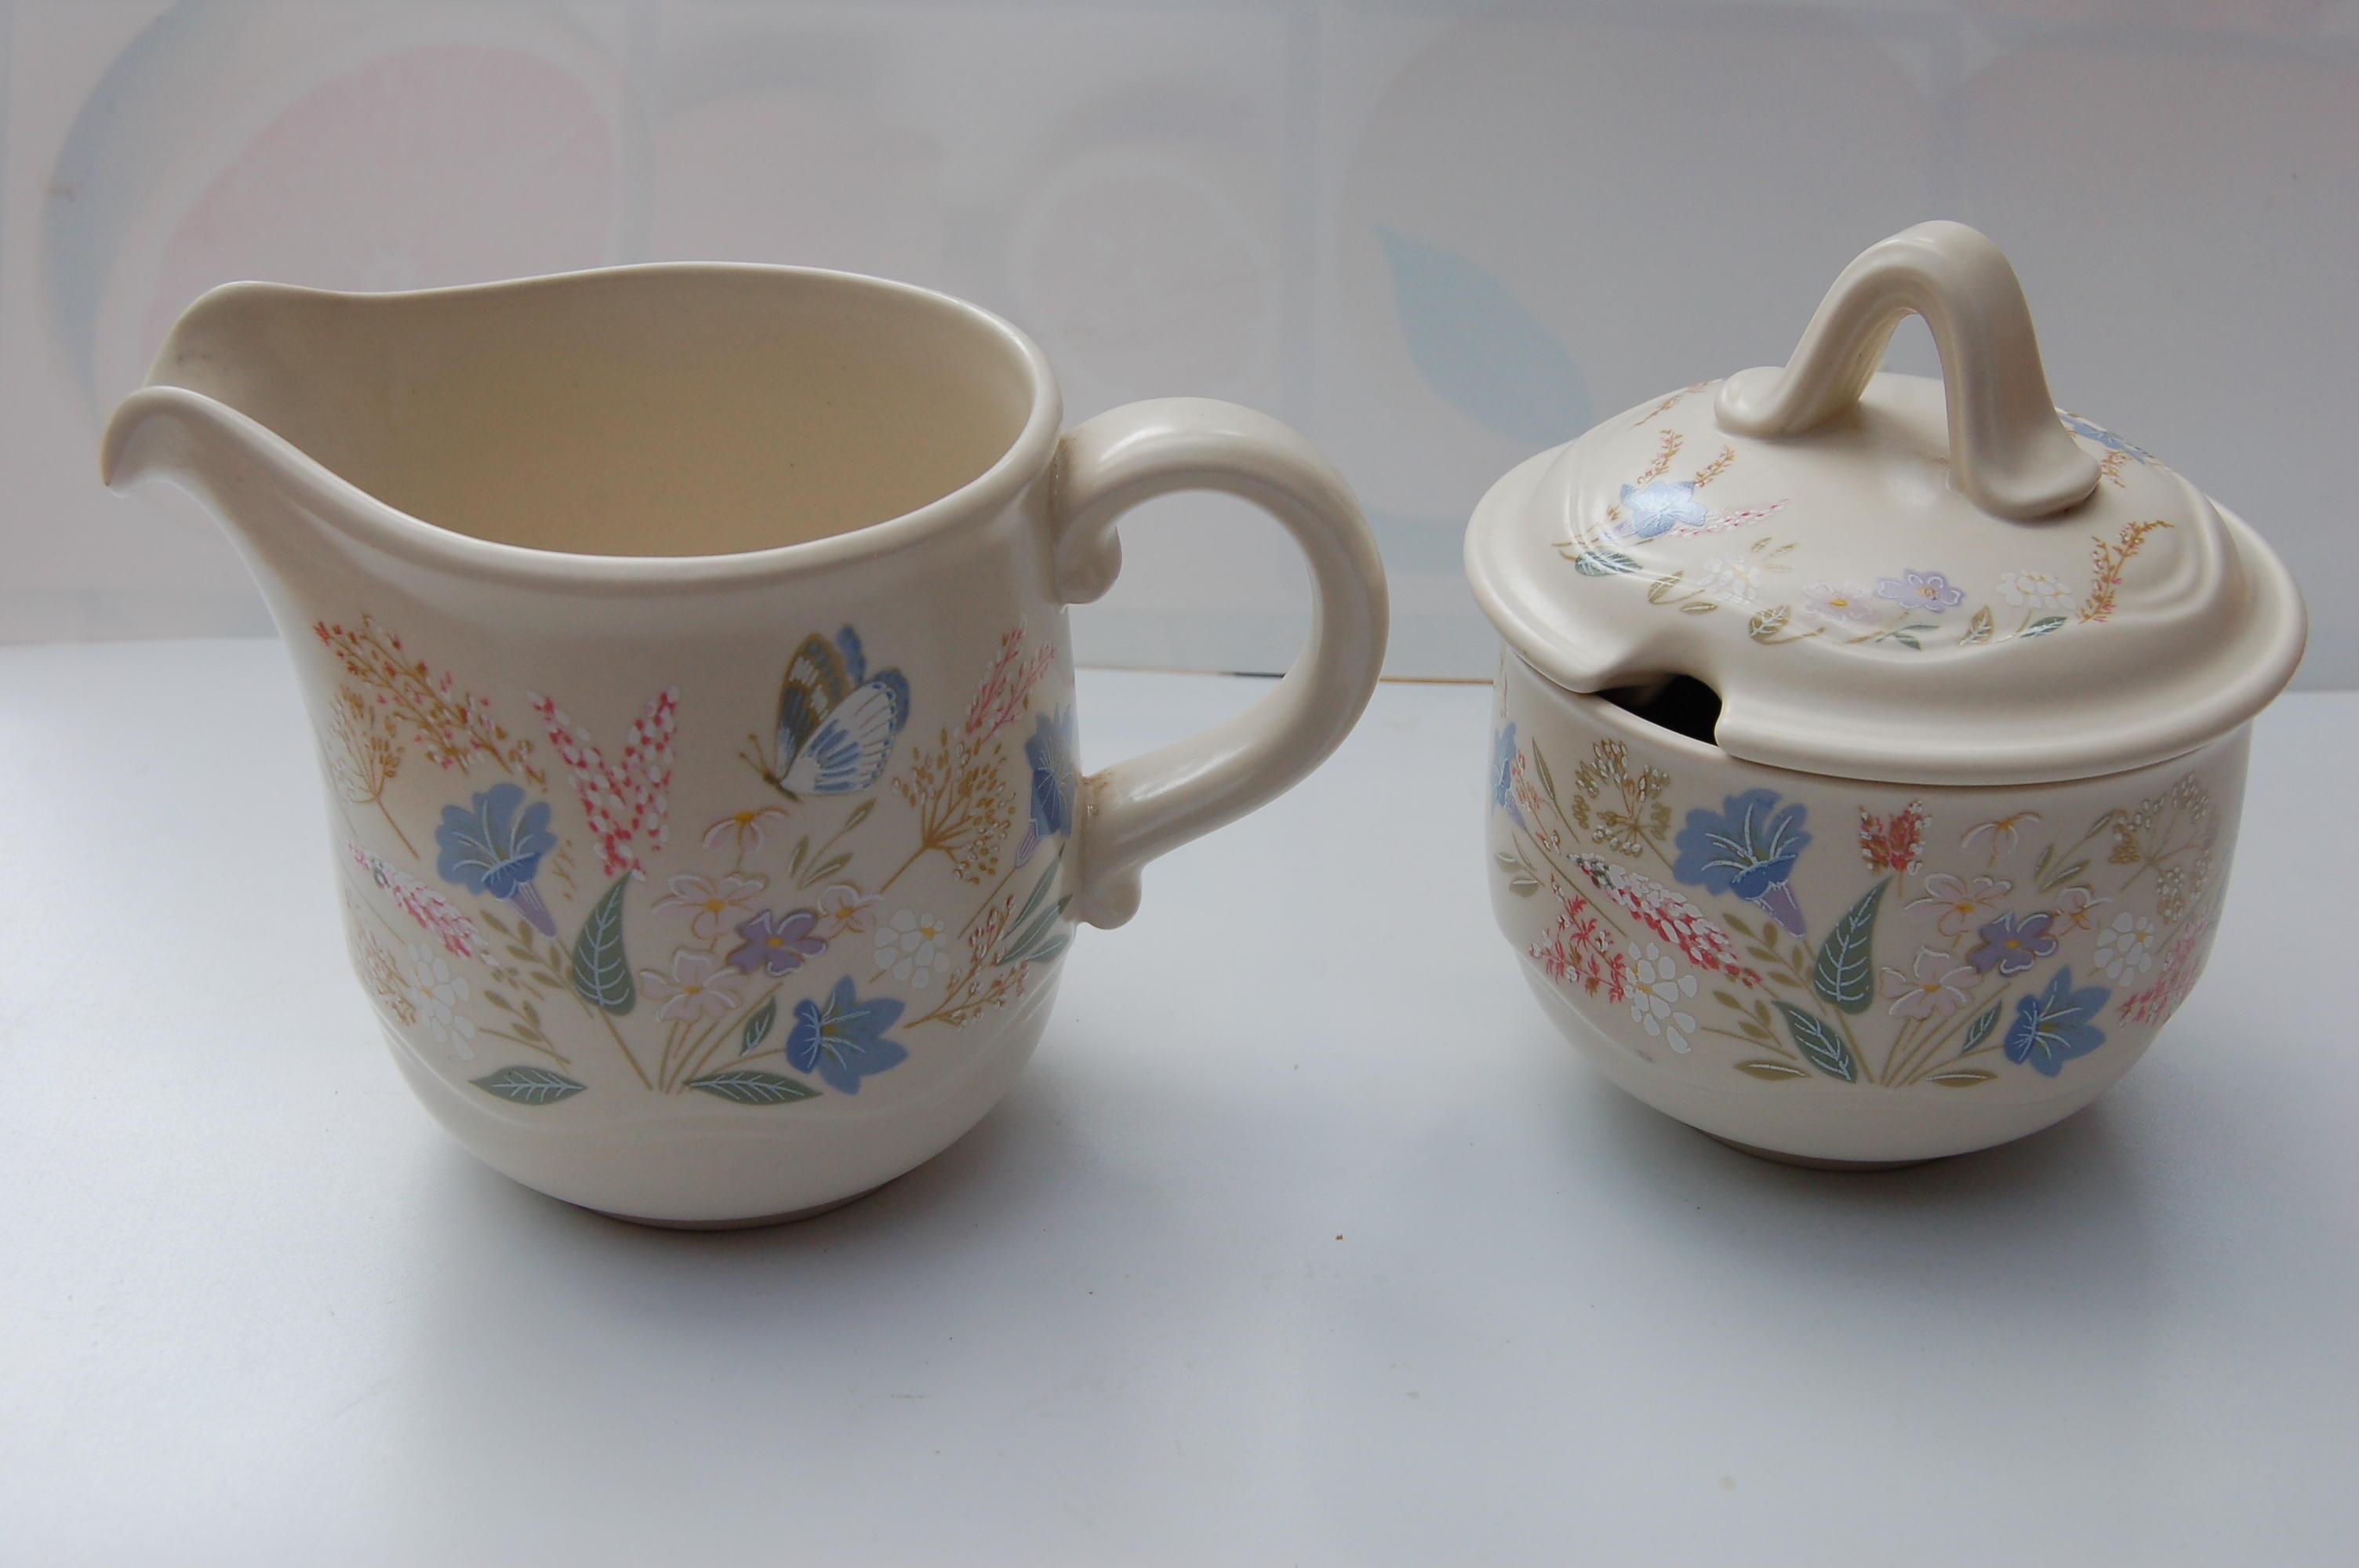 Poole: Springtime Jug & Jam Pot, 2 Floral Plates, one